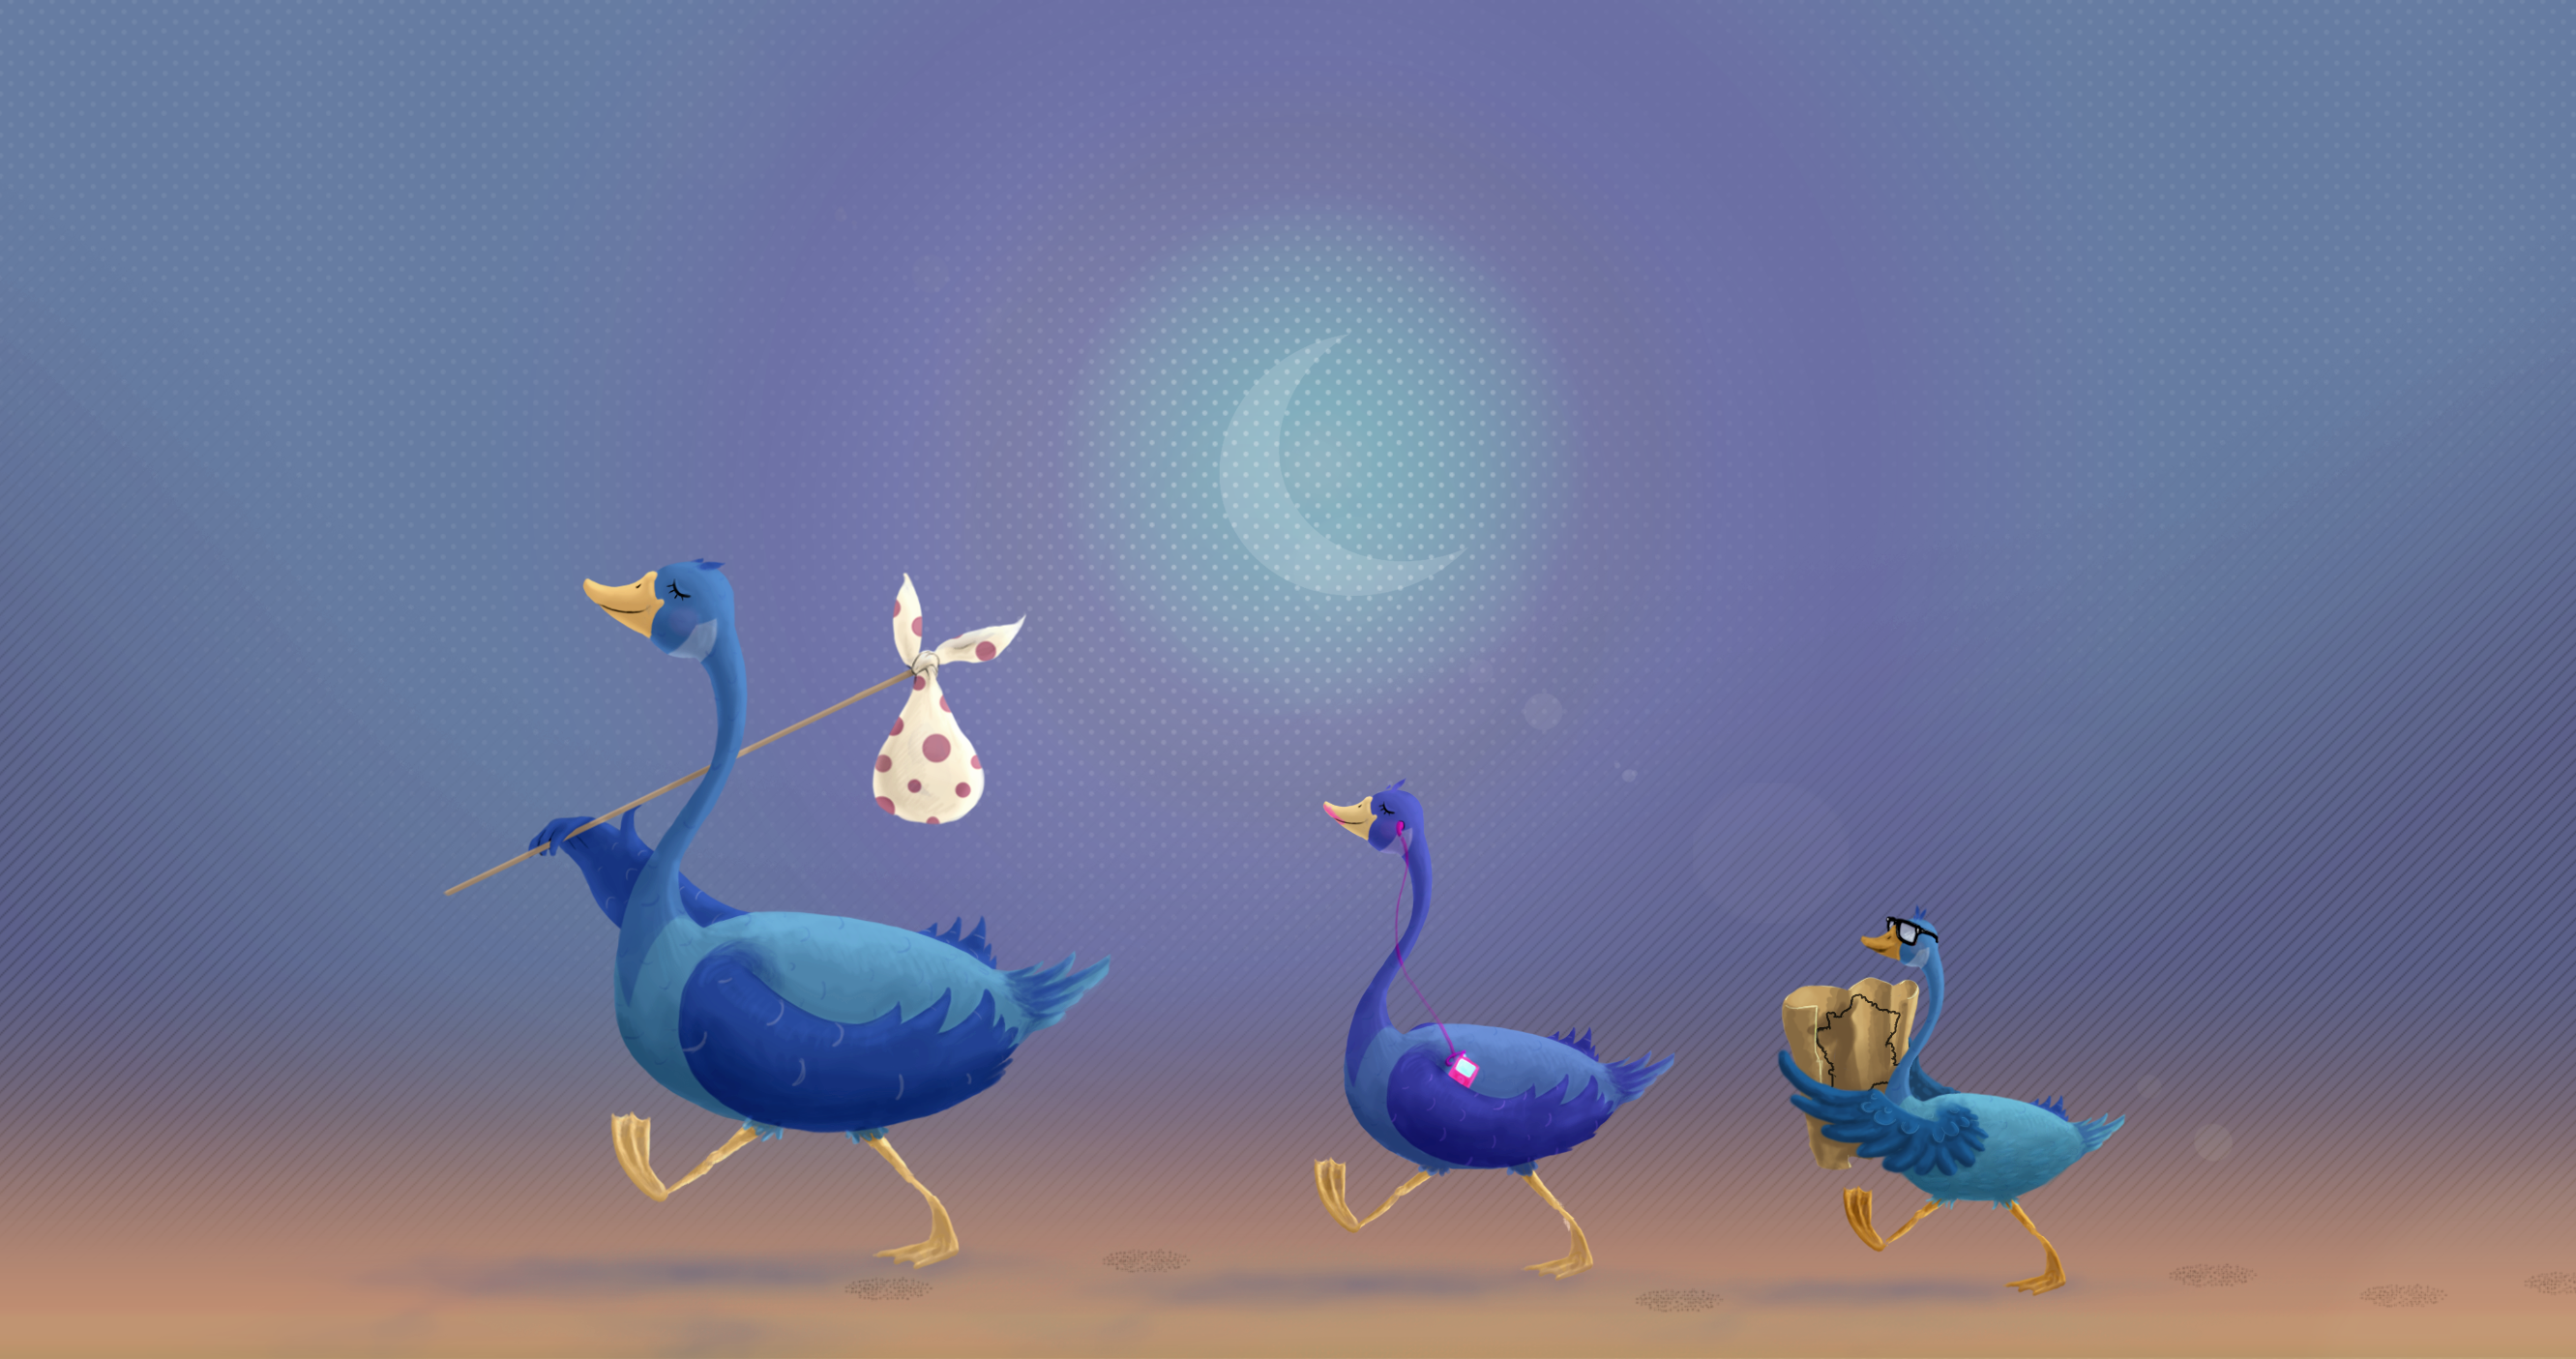 MOOVILY illustration 1